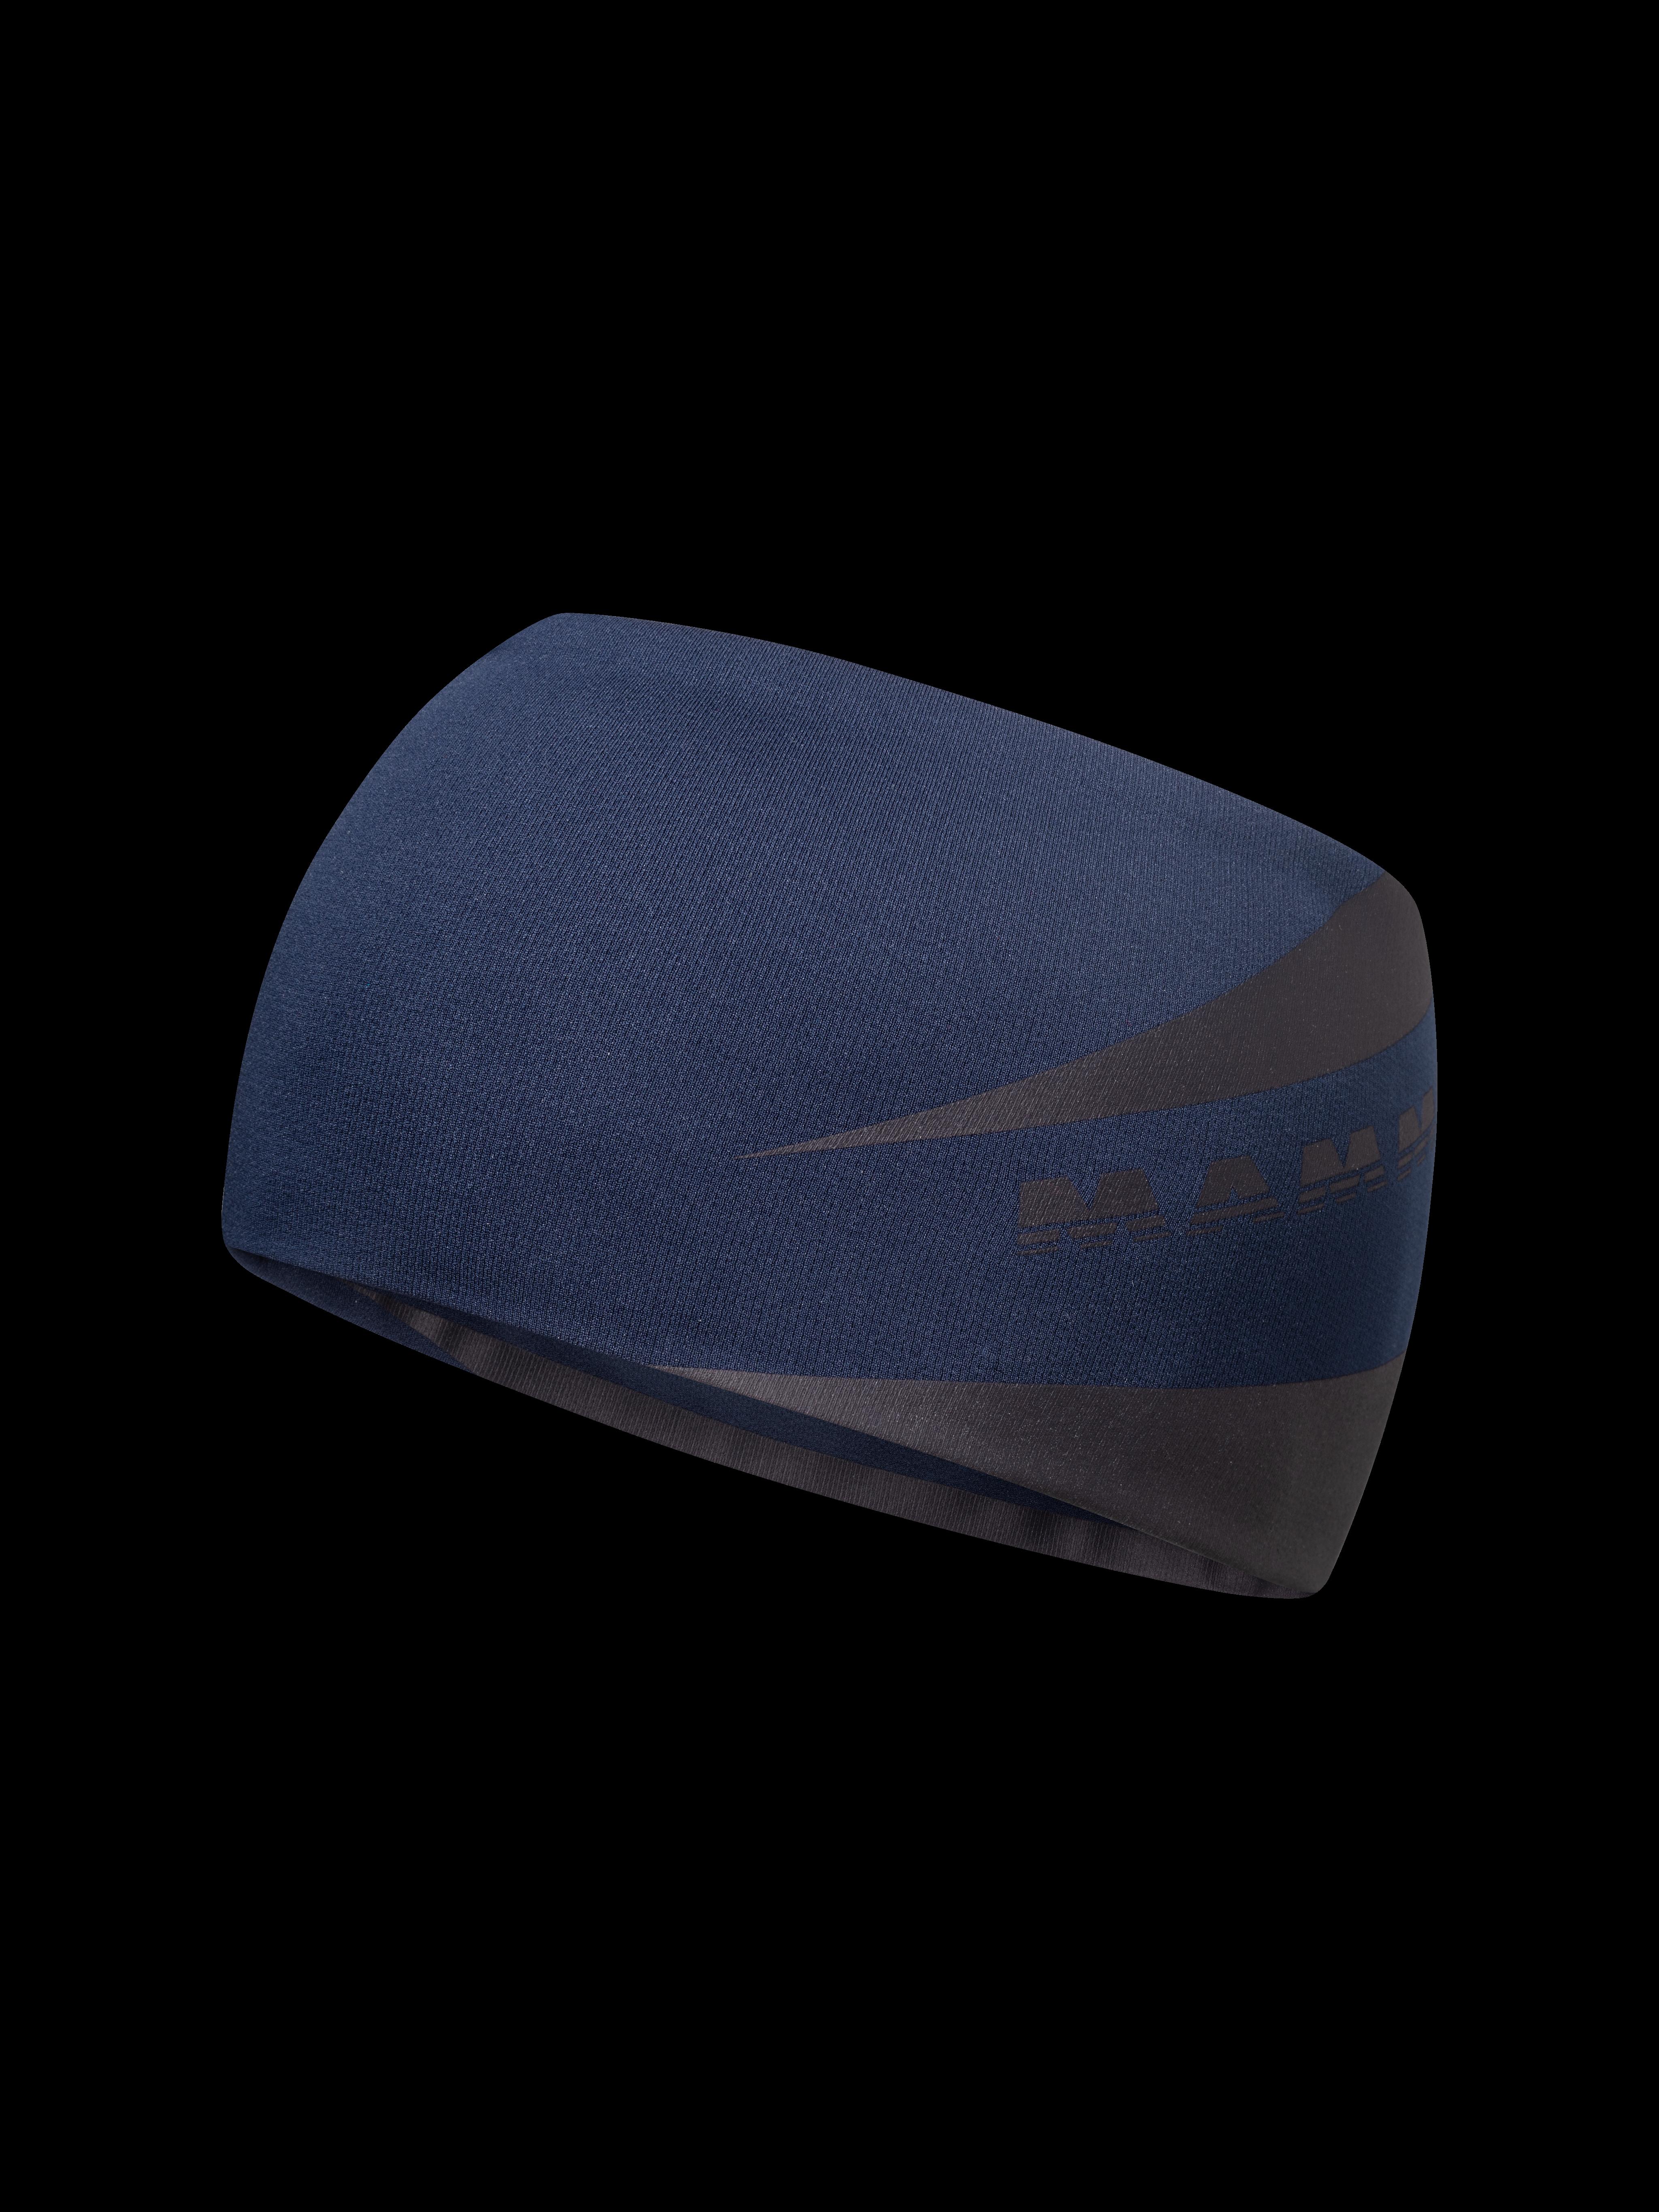 Sertig Headband product image